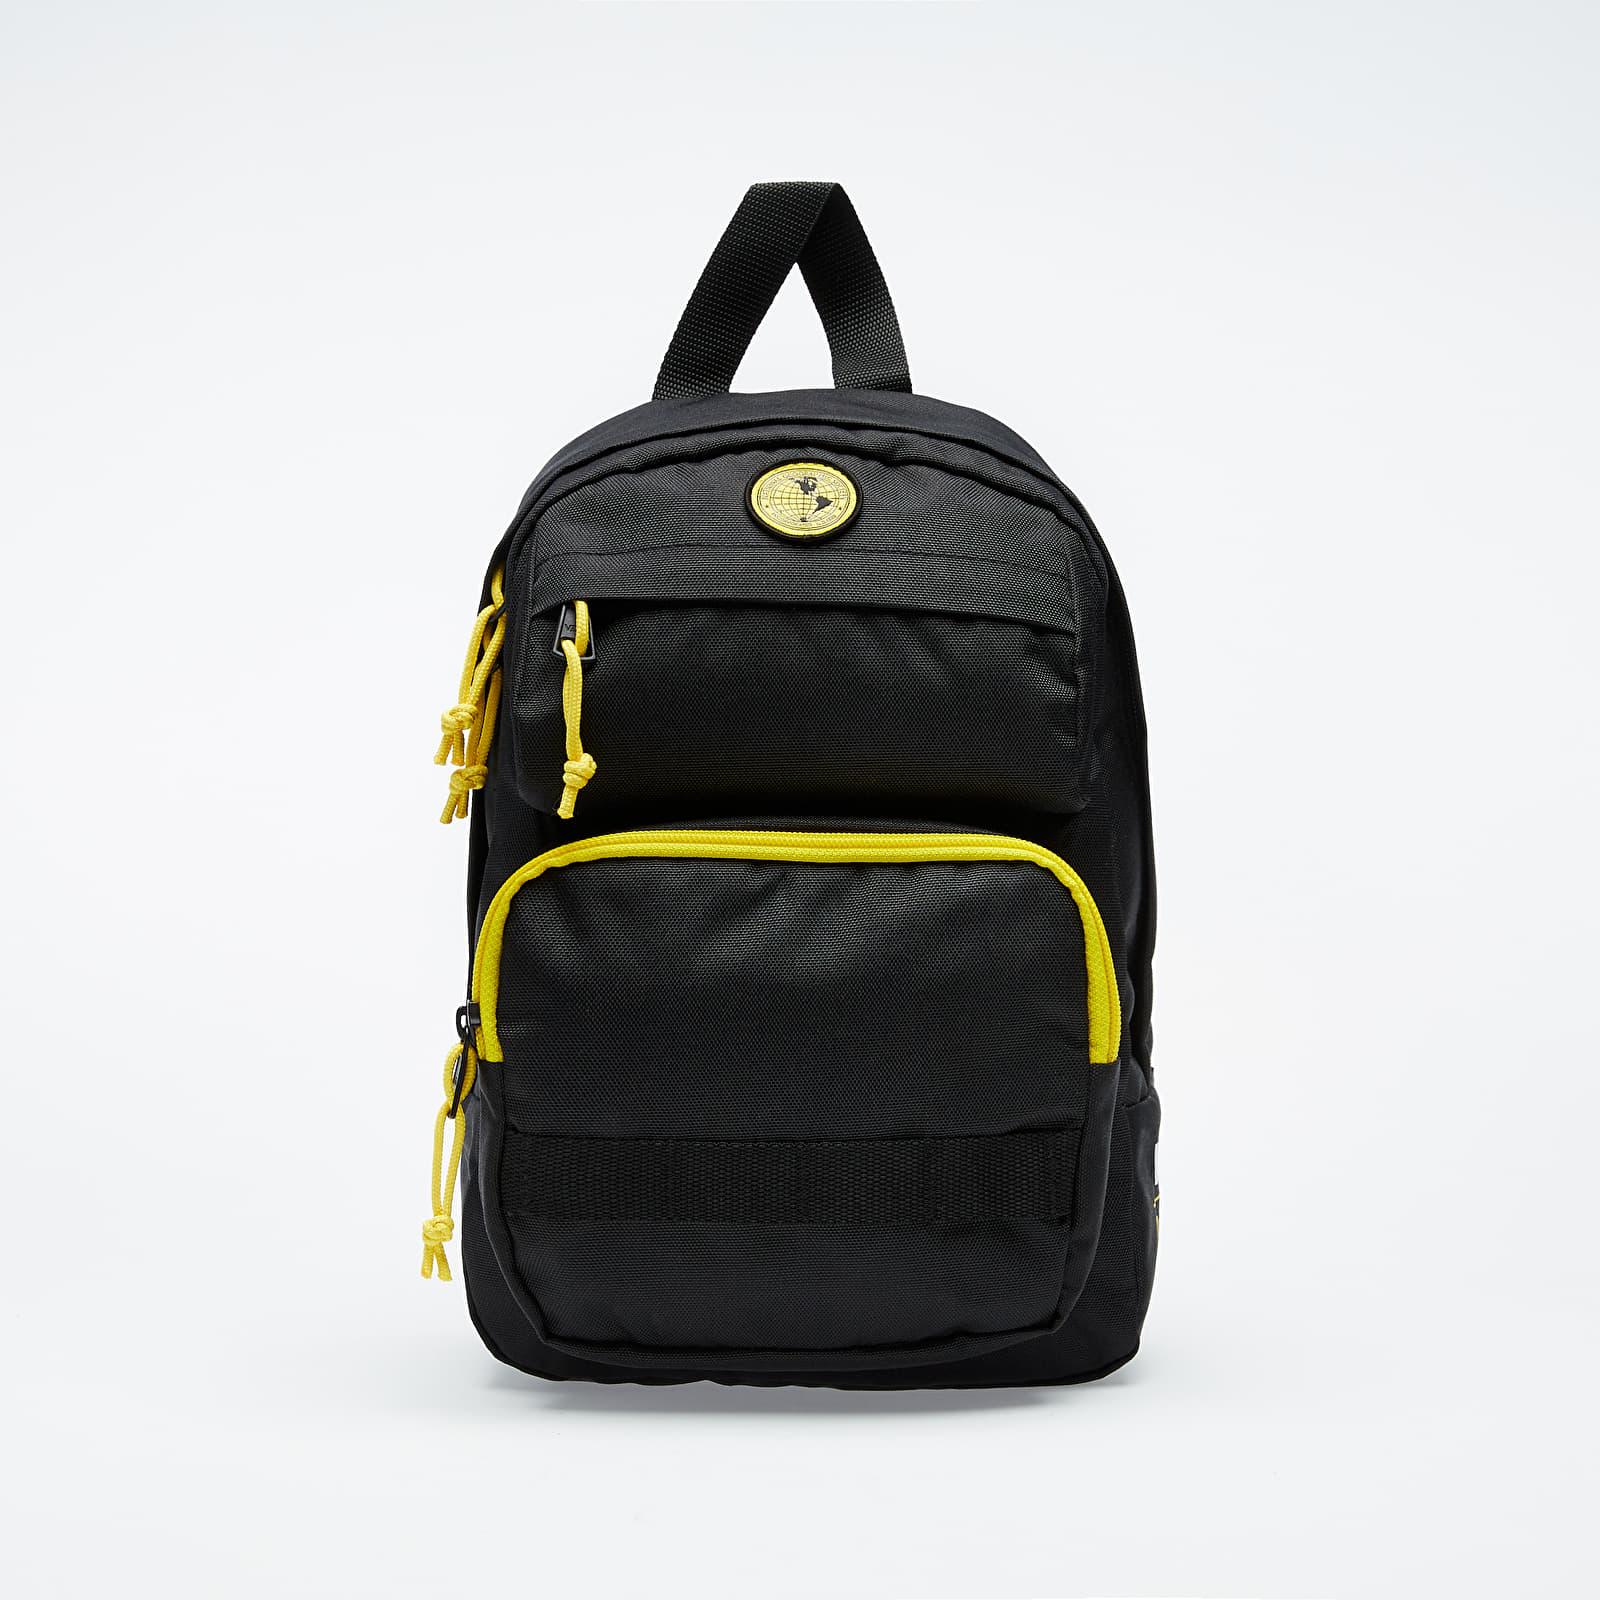 Batohy Vans x National Geographic Backpack Black